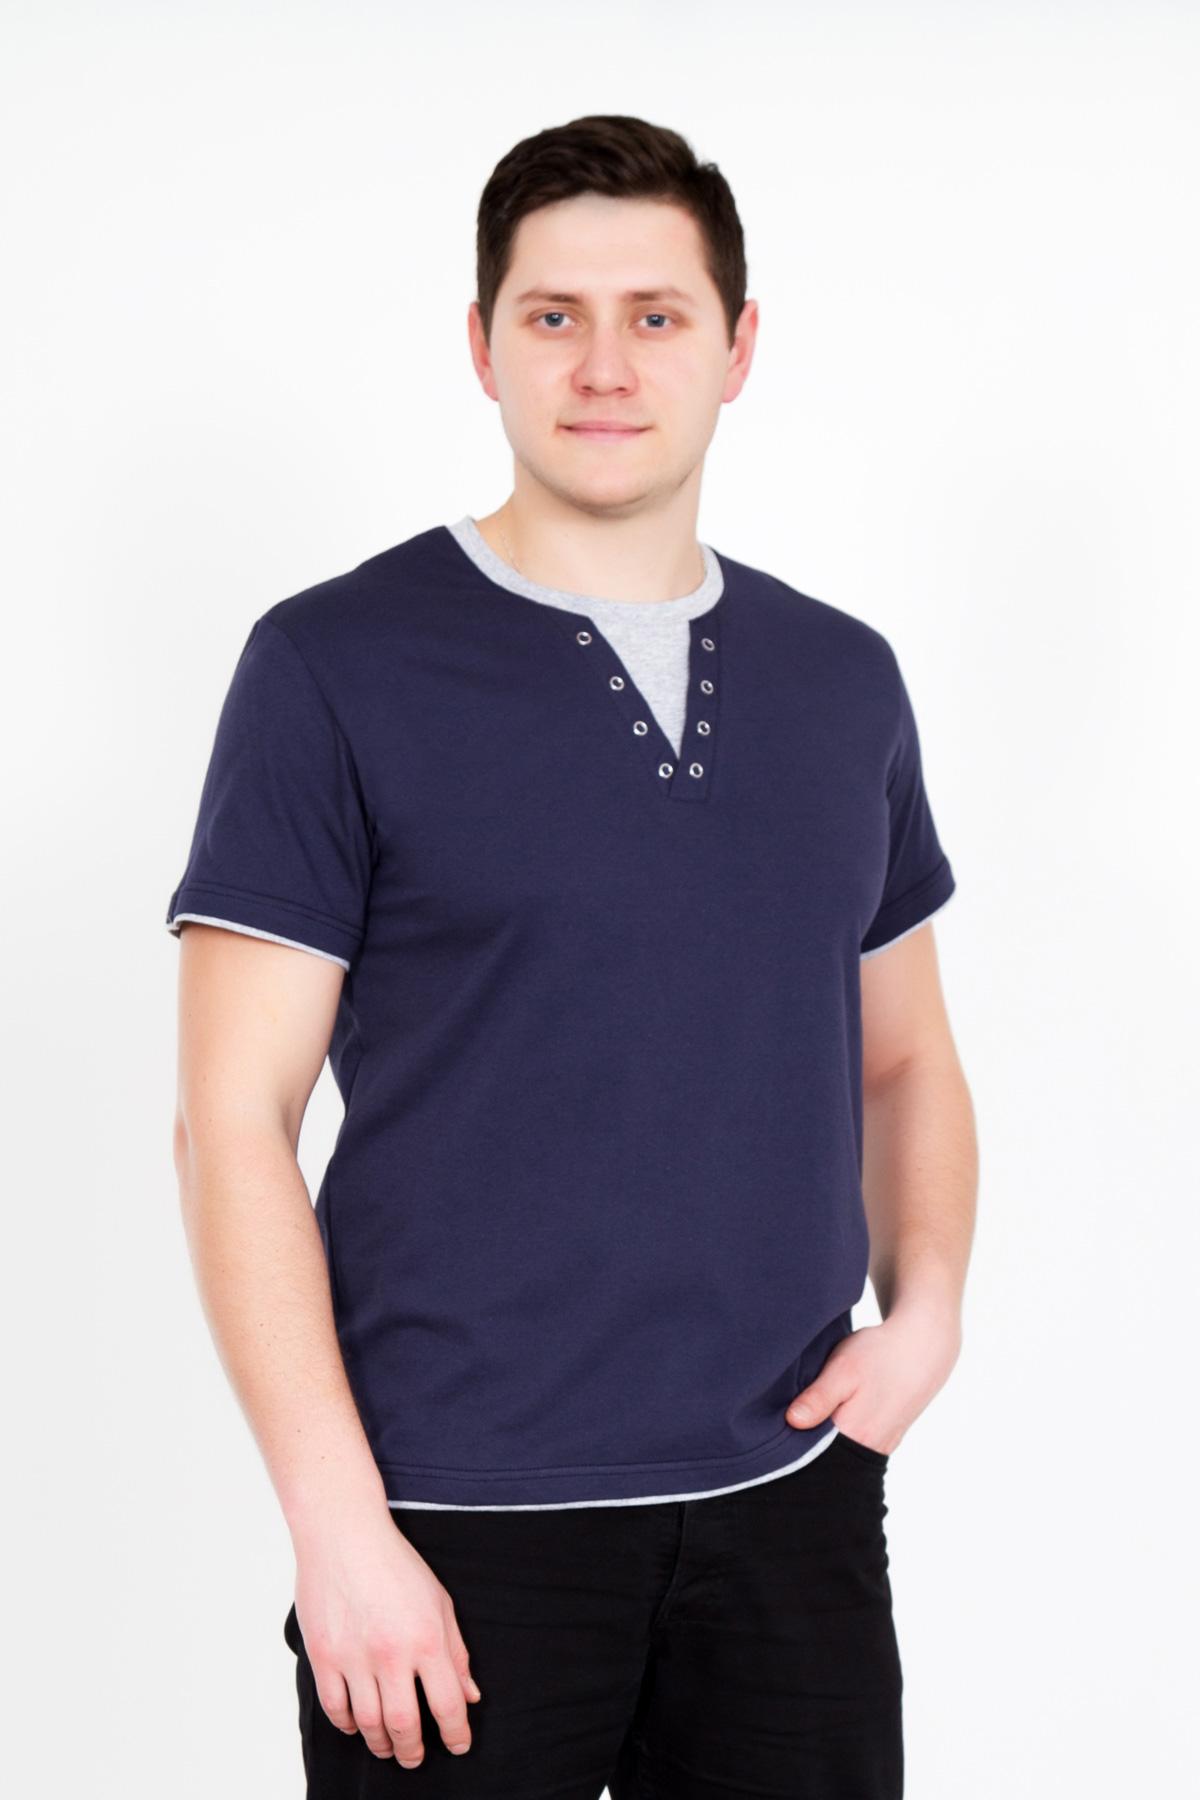 Муж. футболка Джон Синий р. 56Майки и футболки<br>Факт. ОГ: 114 см <br>Факт. ОТ: 110 см <br>Факт. ОБ: 110 см <br>Длина по спинке: 73 см<br><br>Тип: Муж. футболка<br>Размер: 56<br>Материал: Кулирка